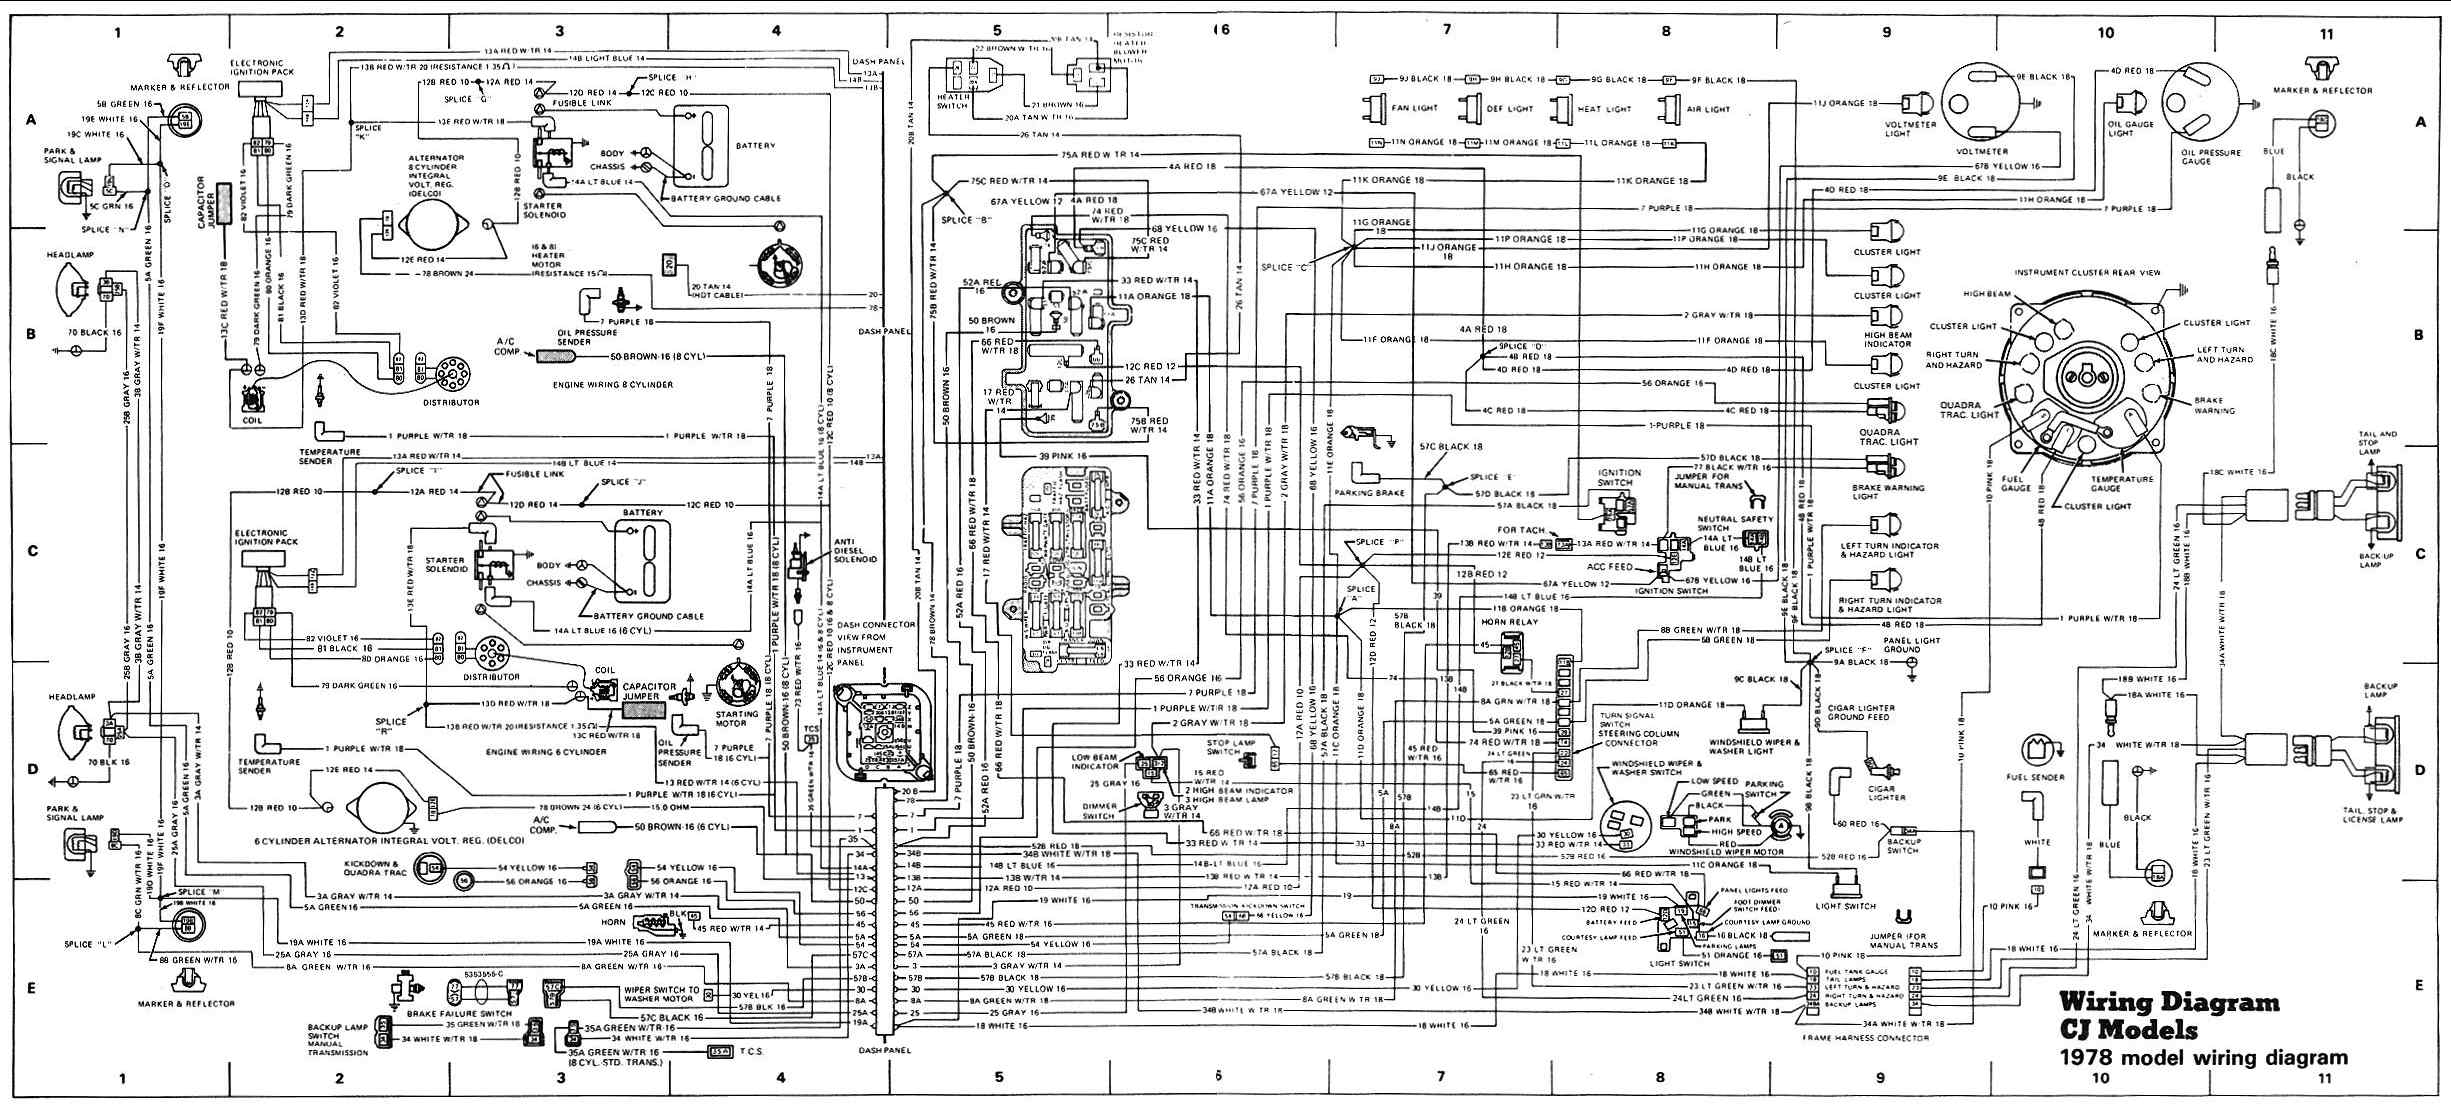 Jeep Car Manuals Wiring Diagrams PDF Fault Codes